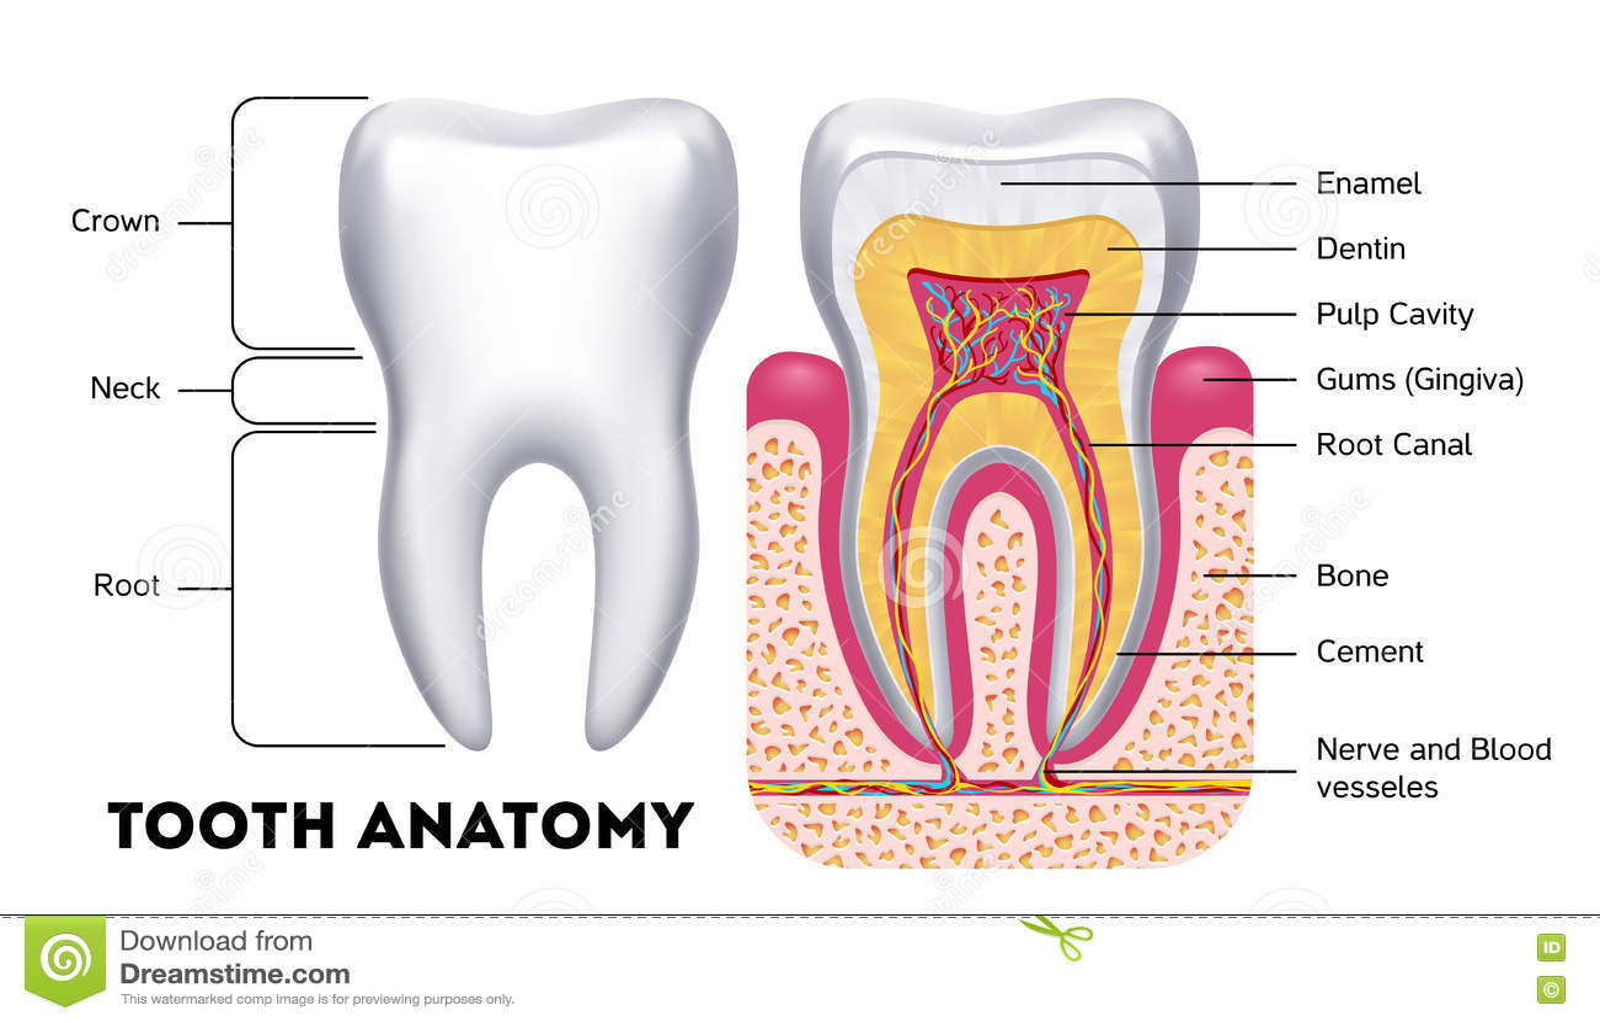 dental anatomy books free download pdf